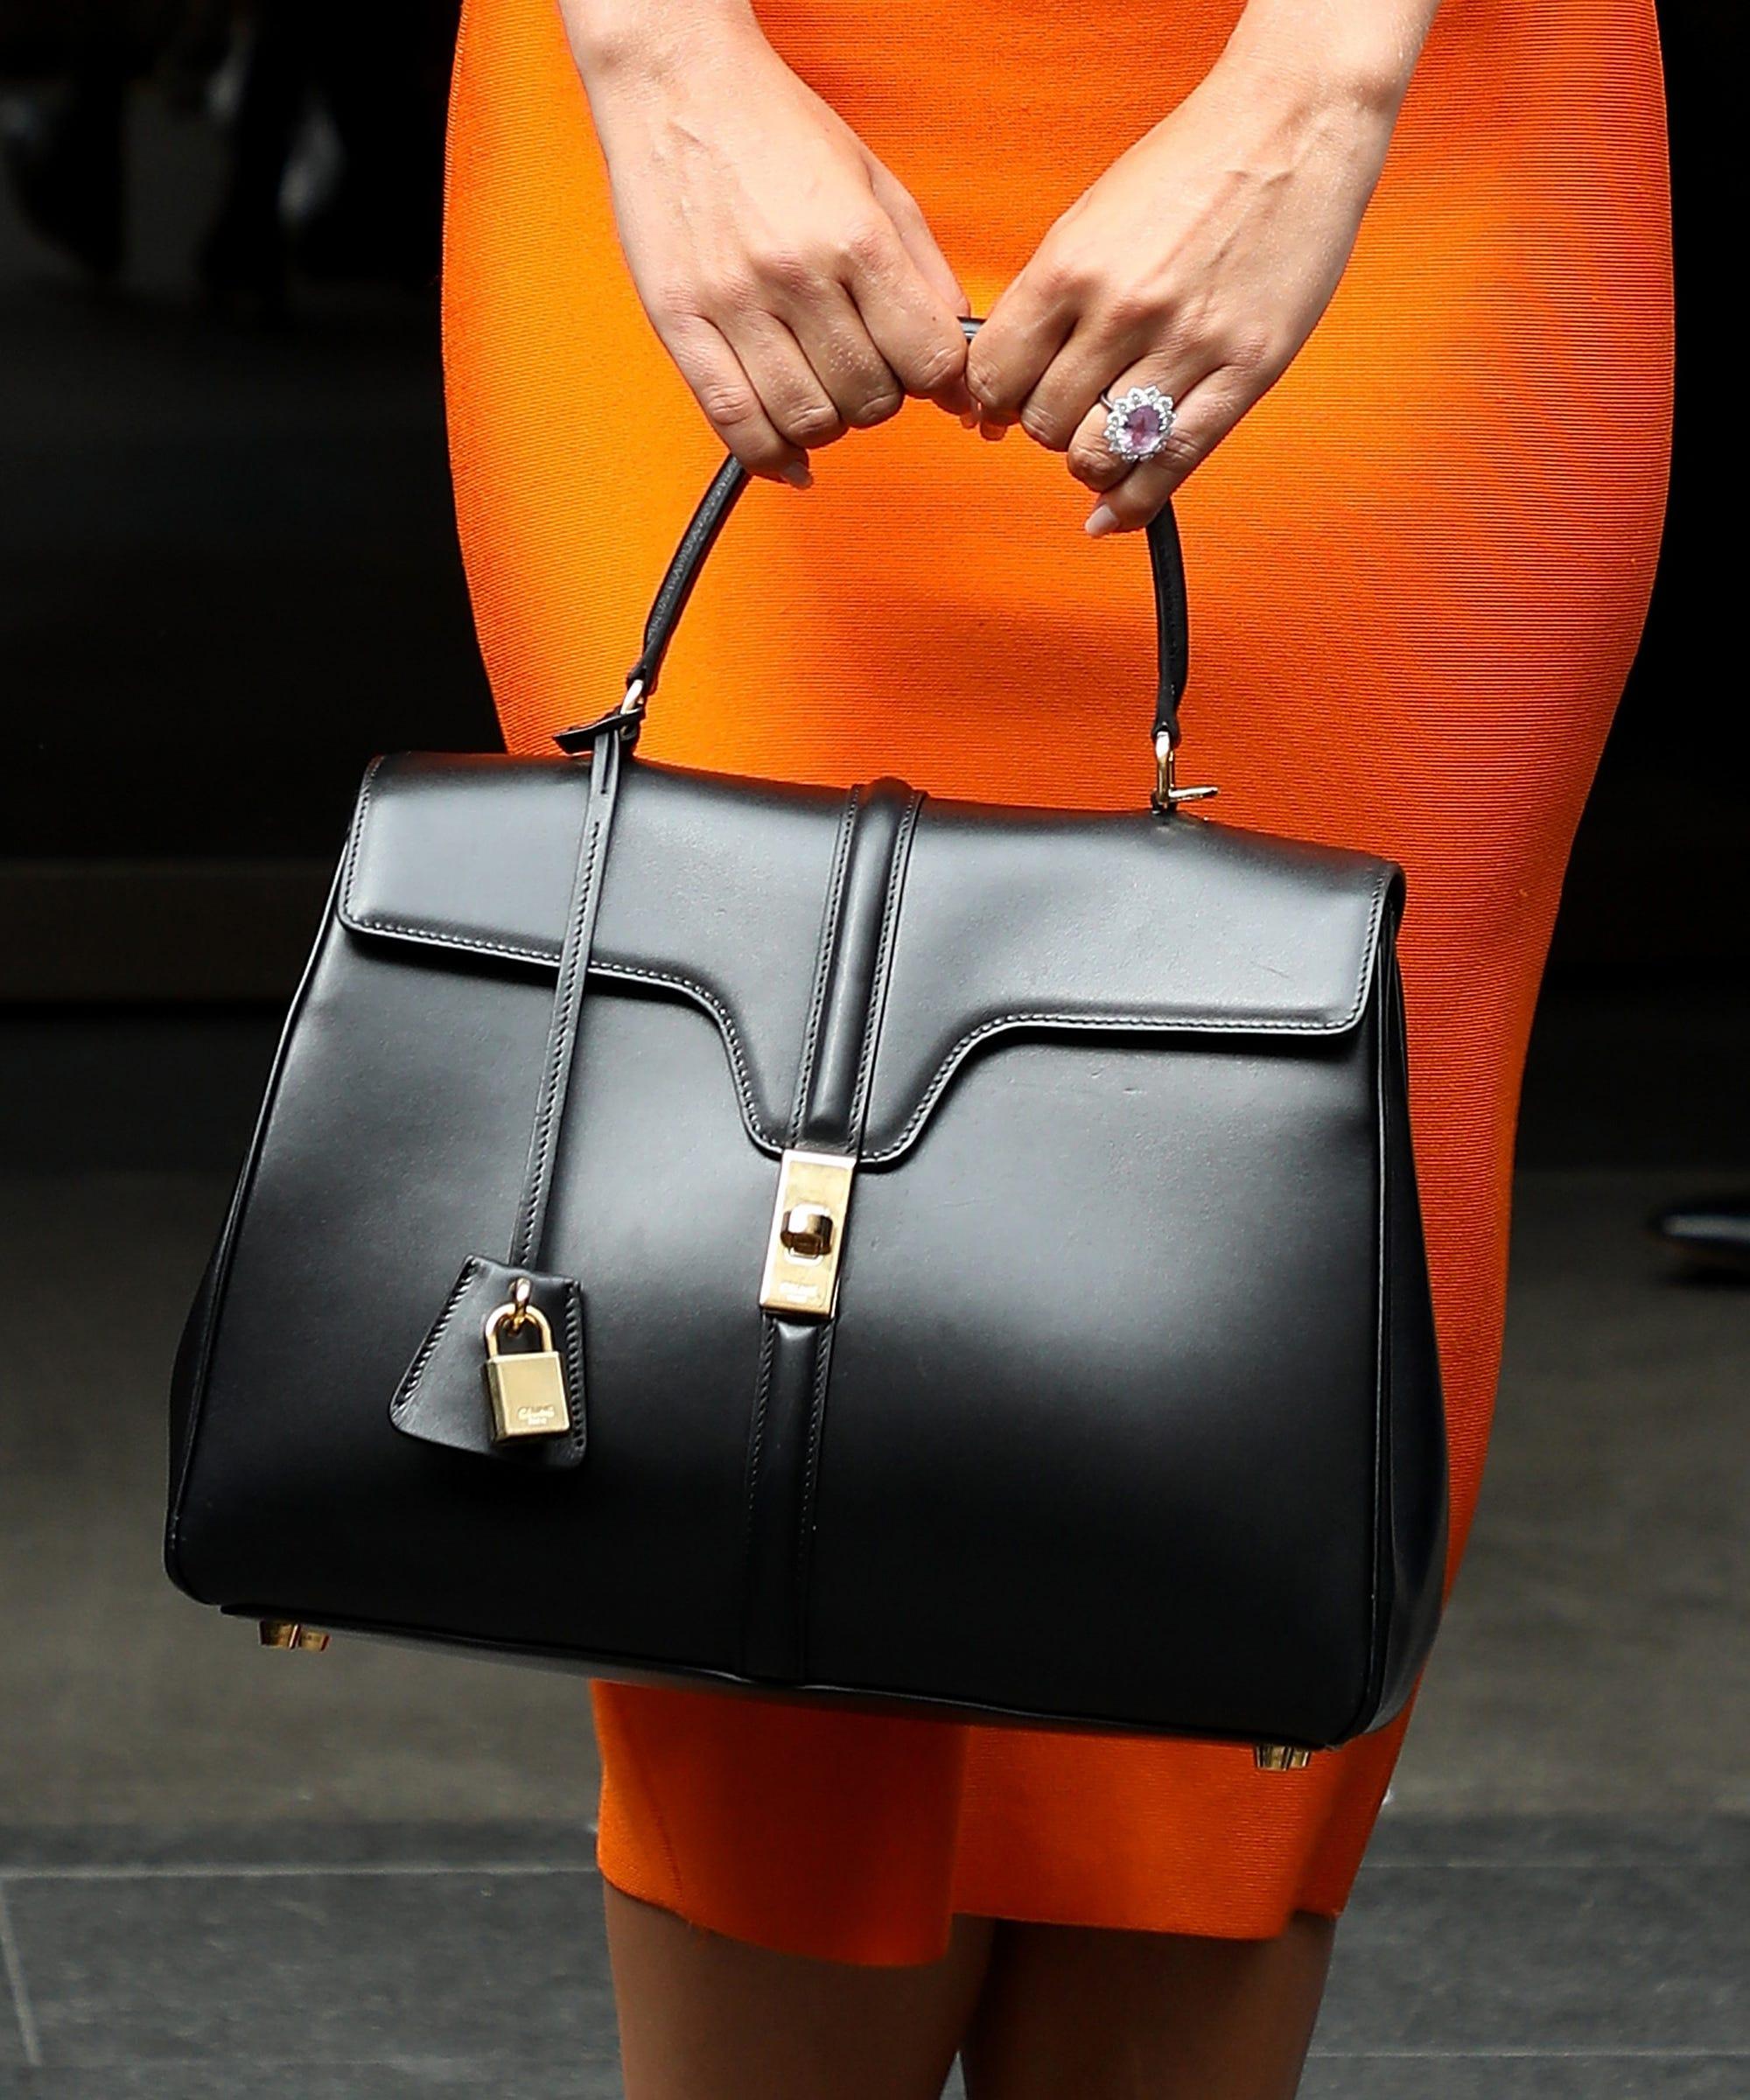 Lady Gaga Carries First Hedi Slimane Celine Bag